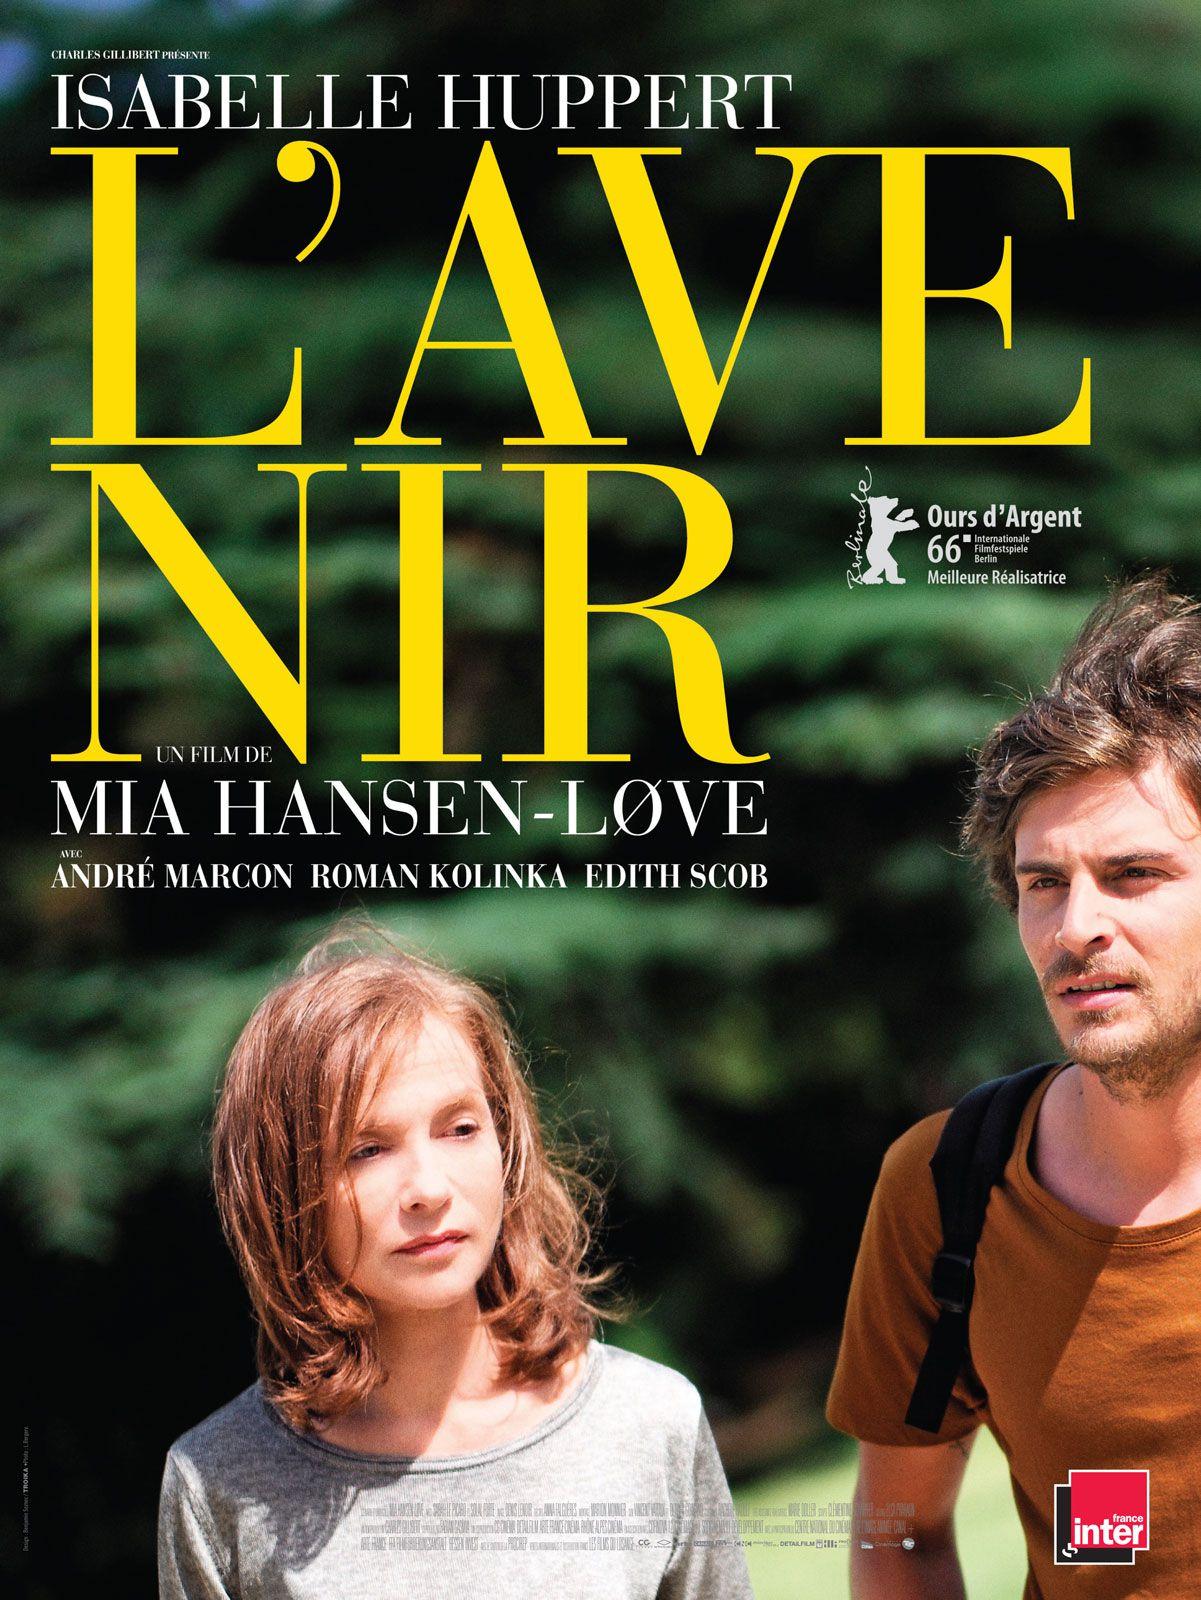 L'Avenir - Film (2016)